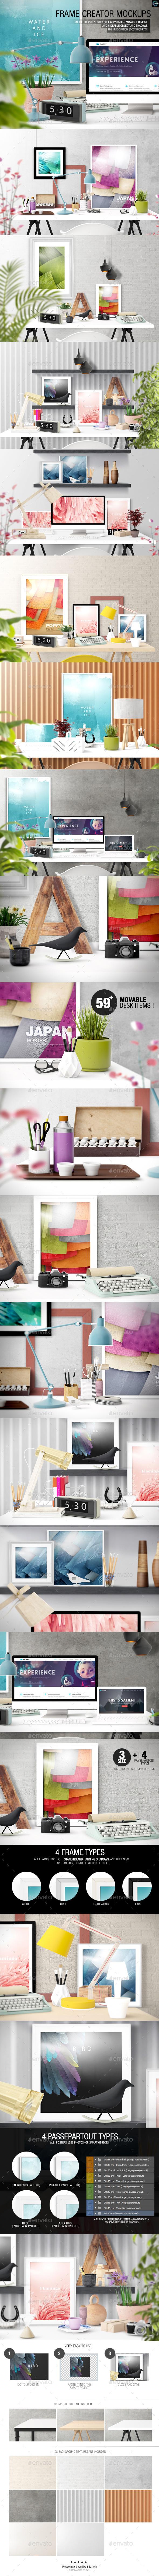 GraphicRiver Frame Creator Mockups 10243843